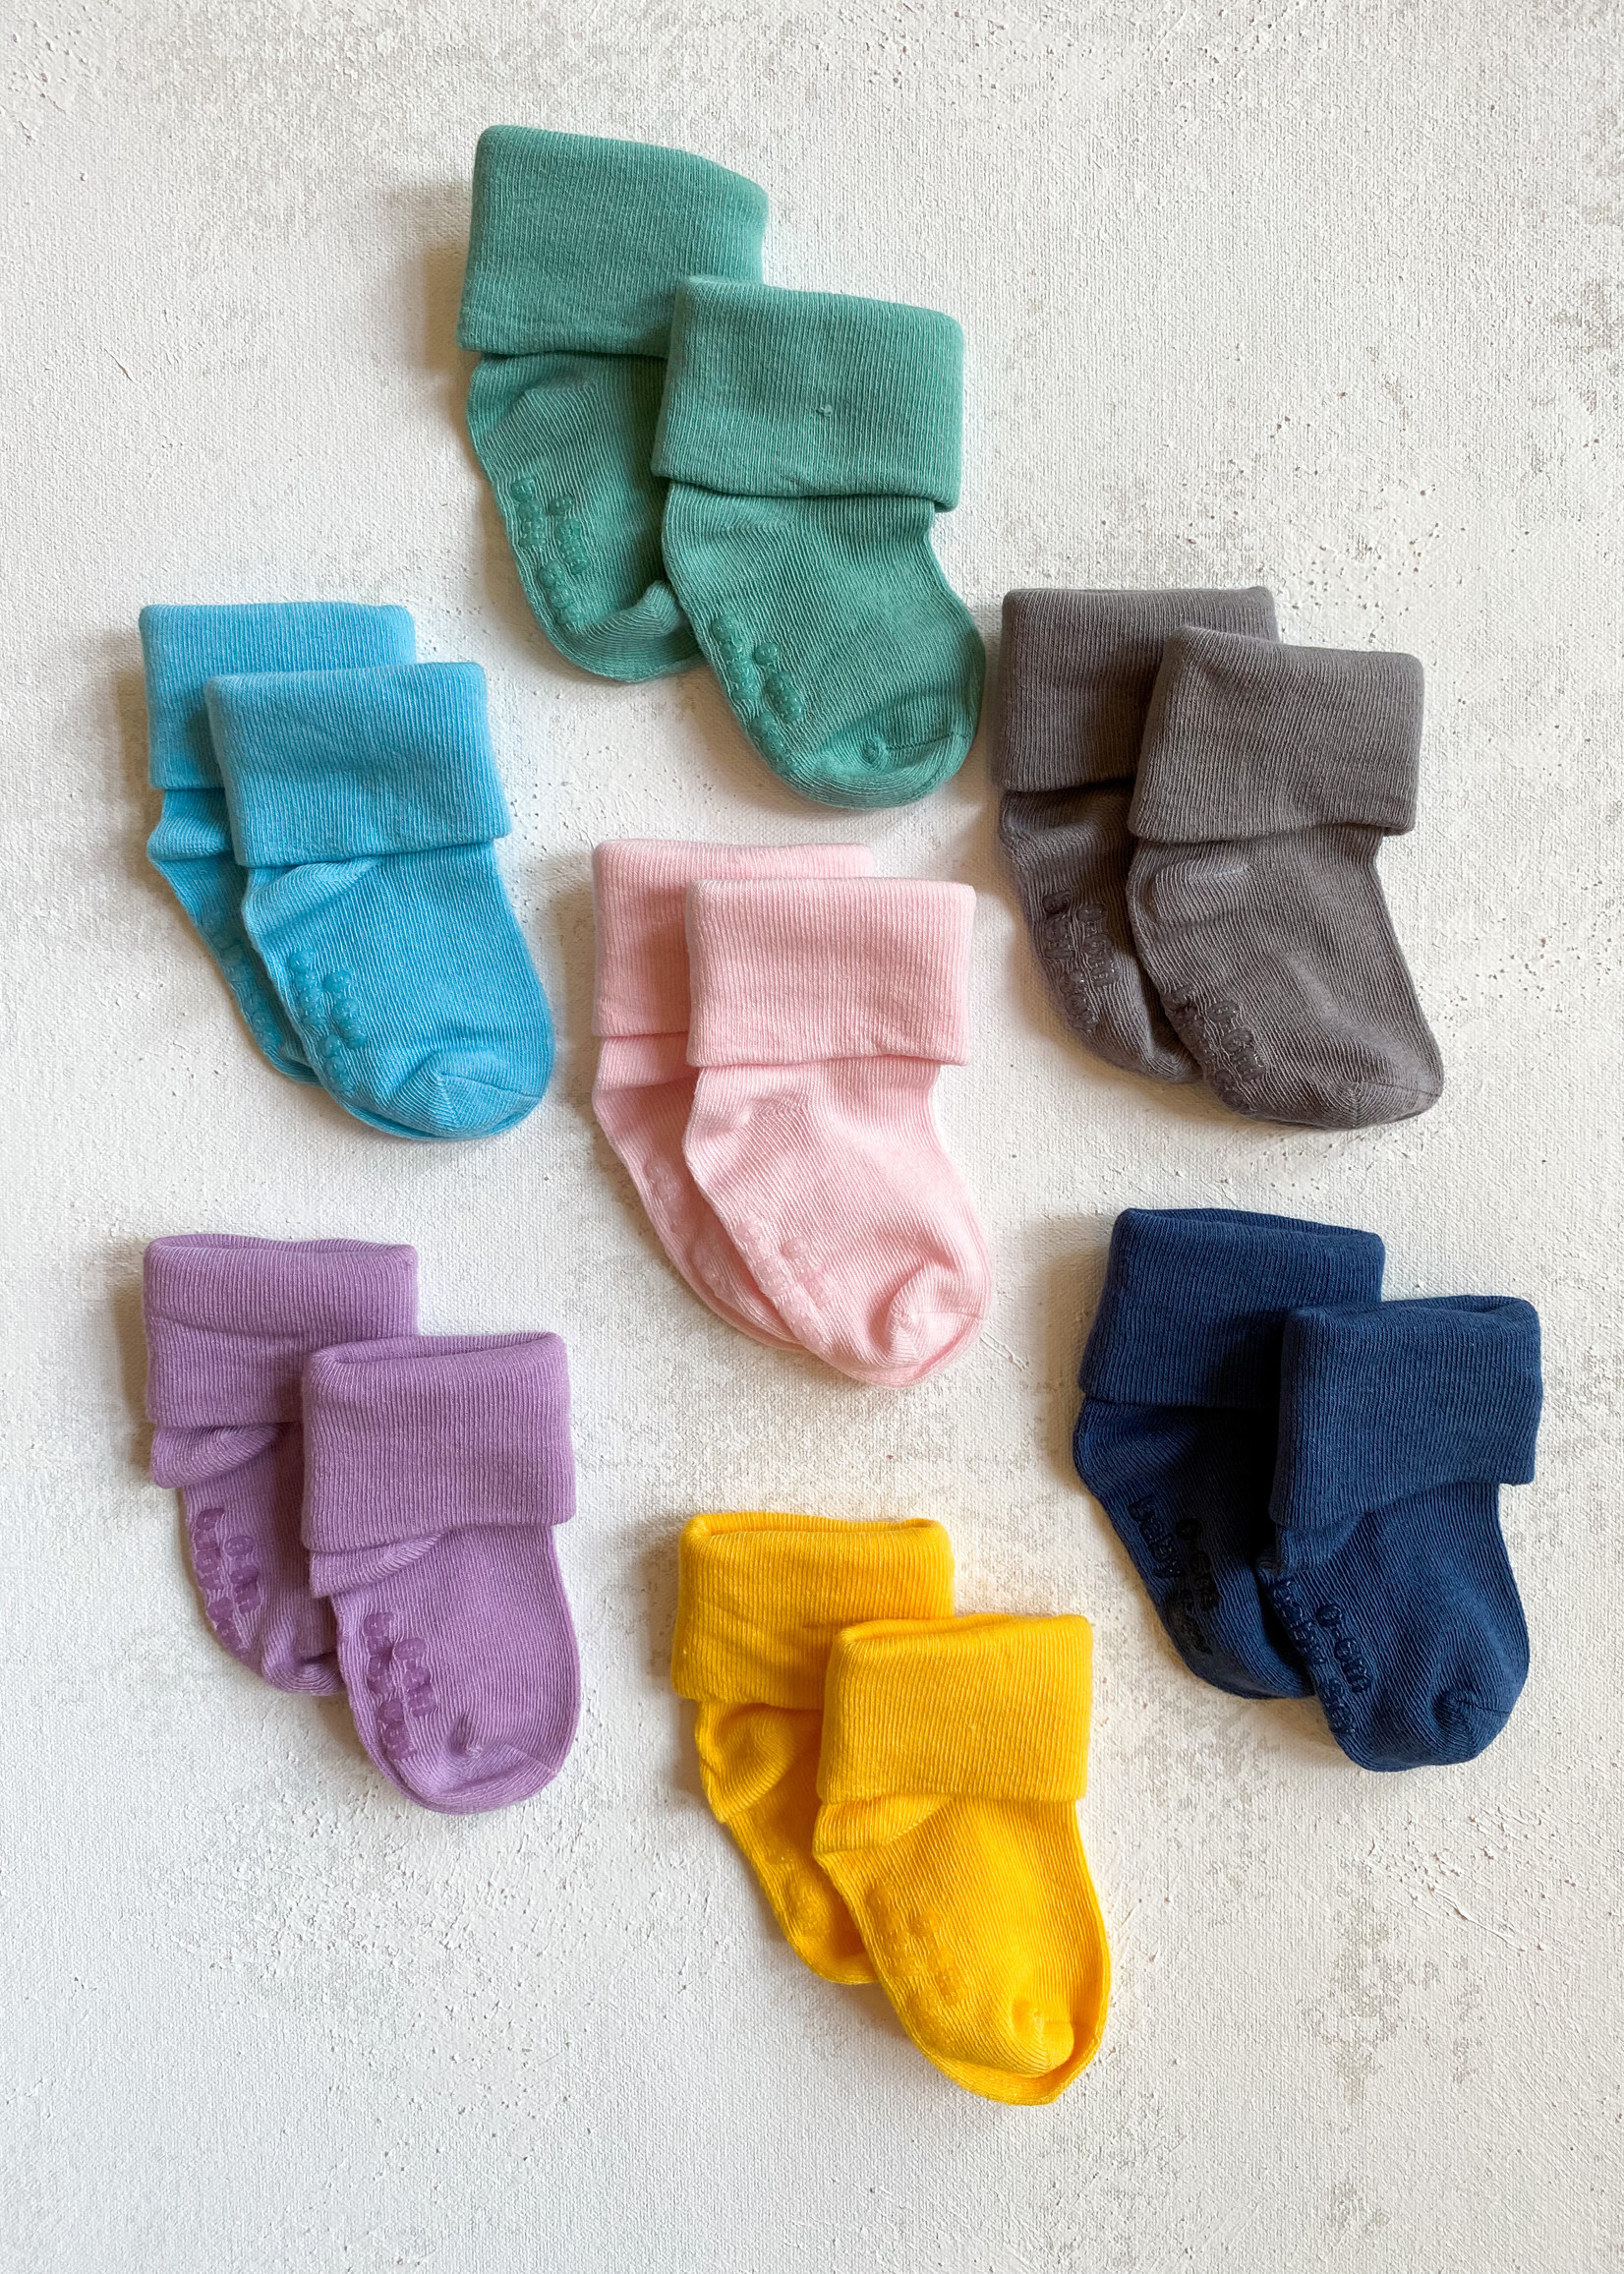 Elitaire Petite Modern Socks in Peony